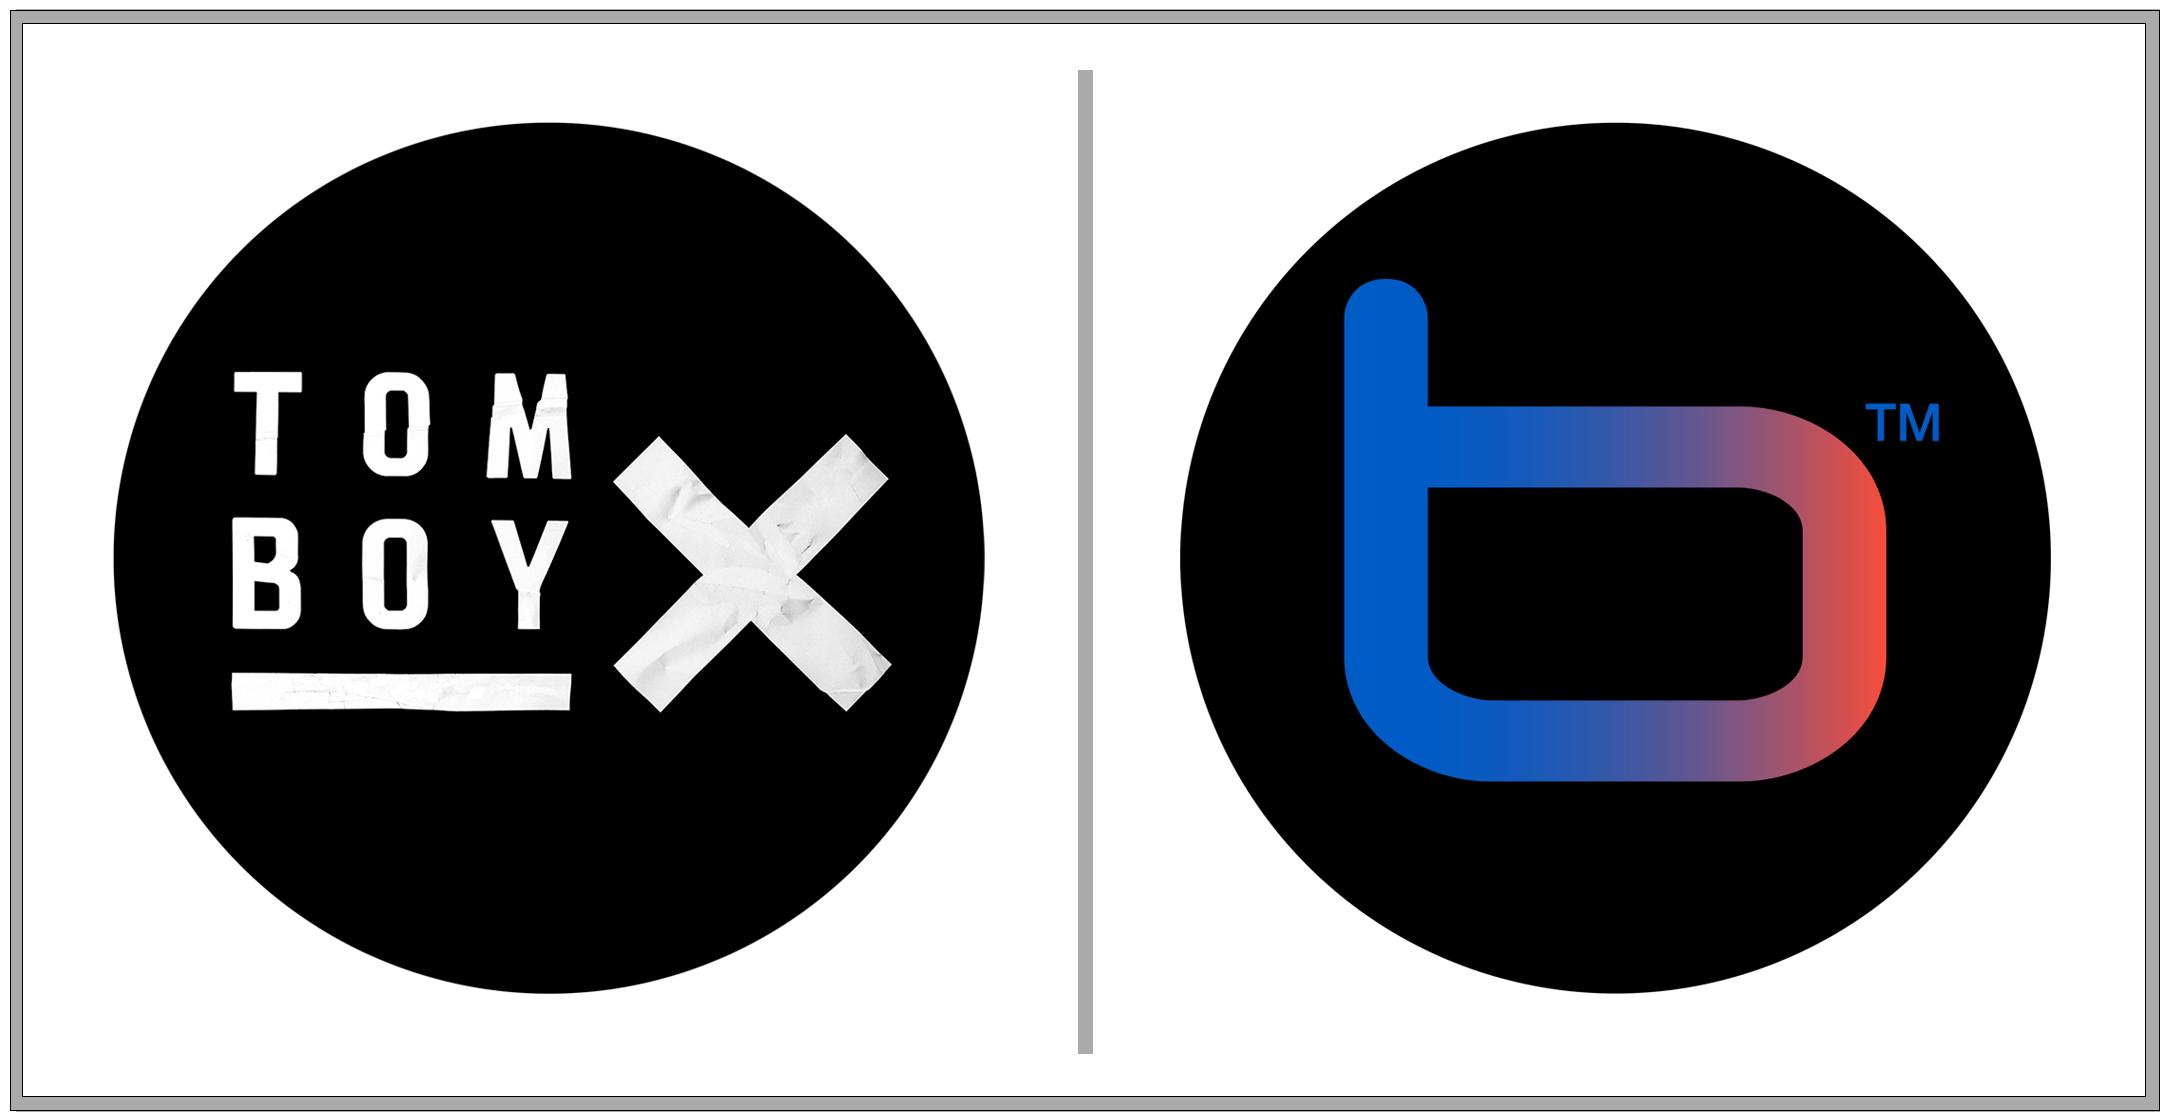 TOMBOYx+Blue-Fever-Logos.png